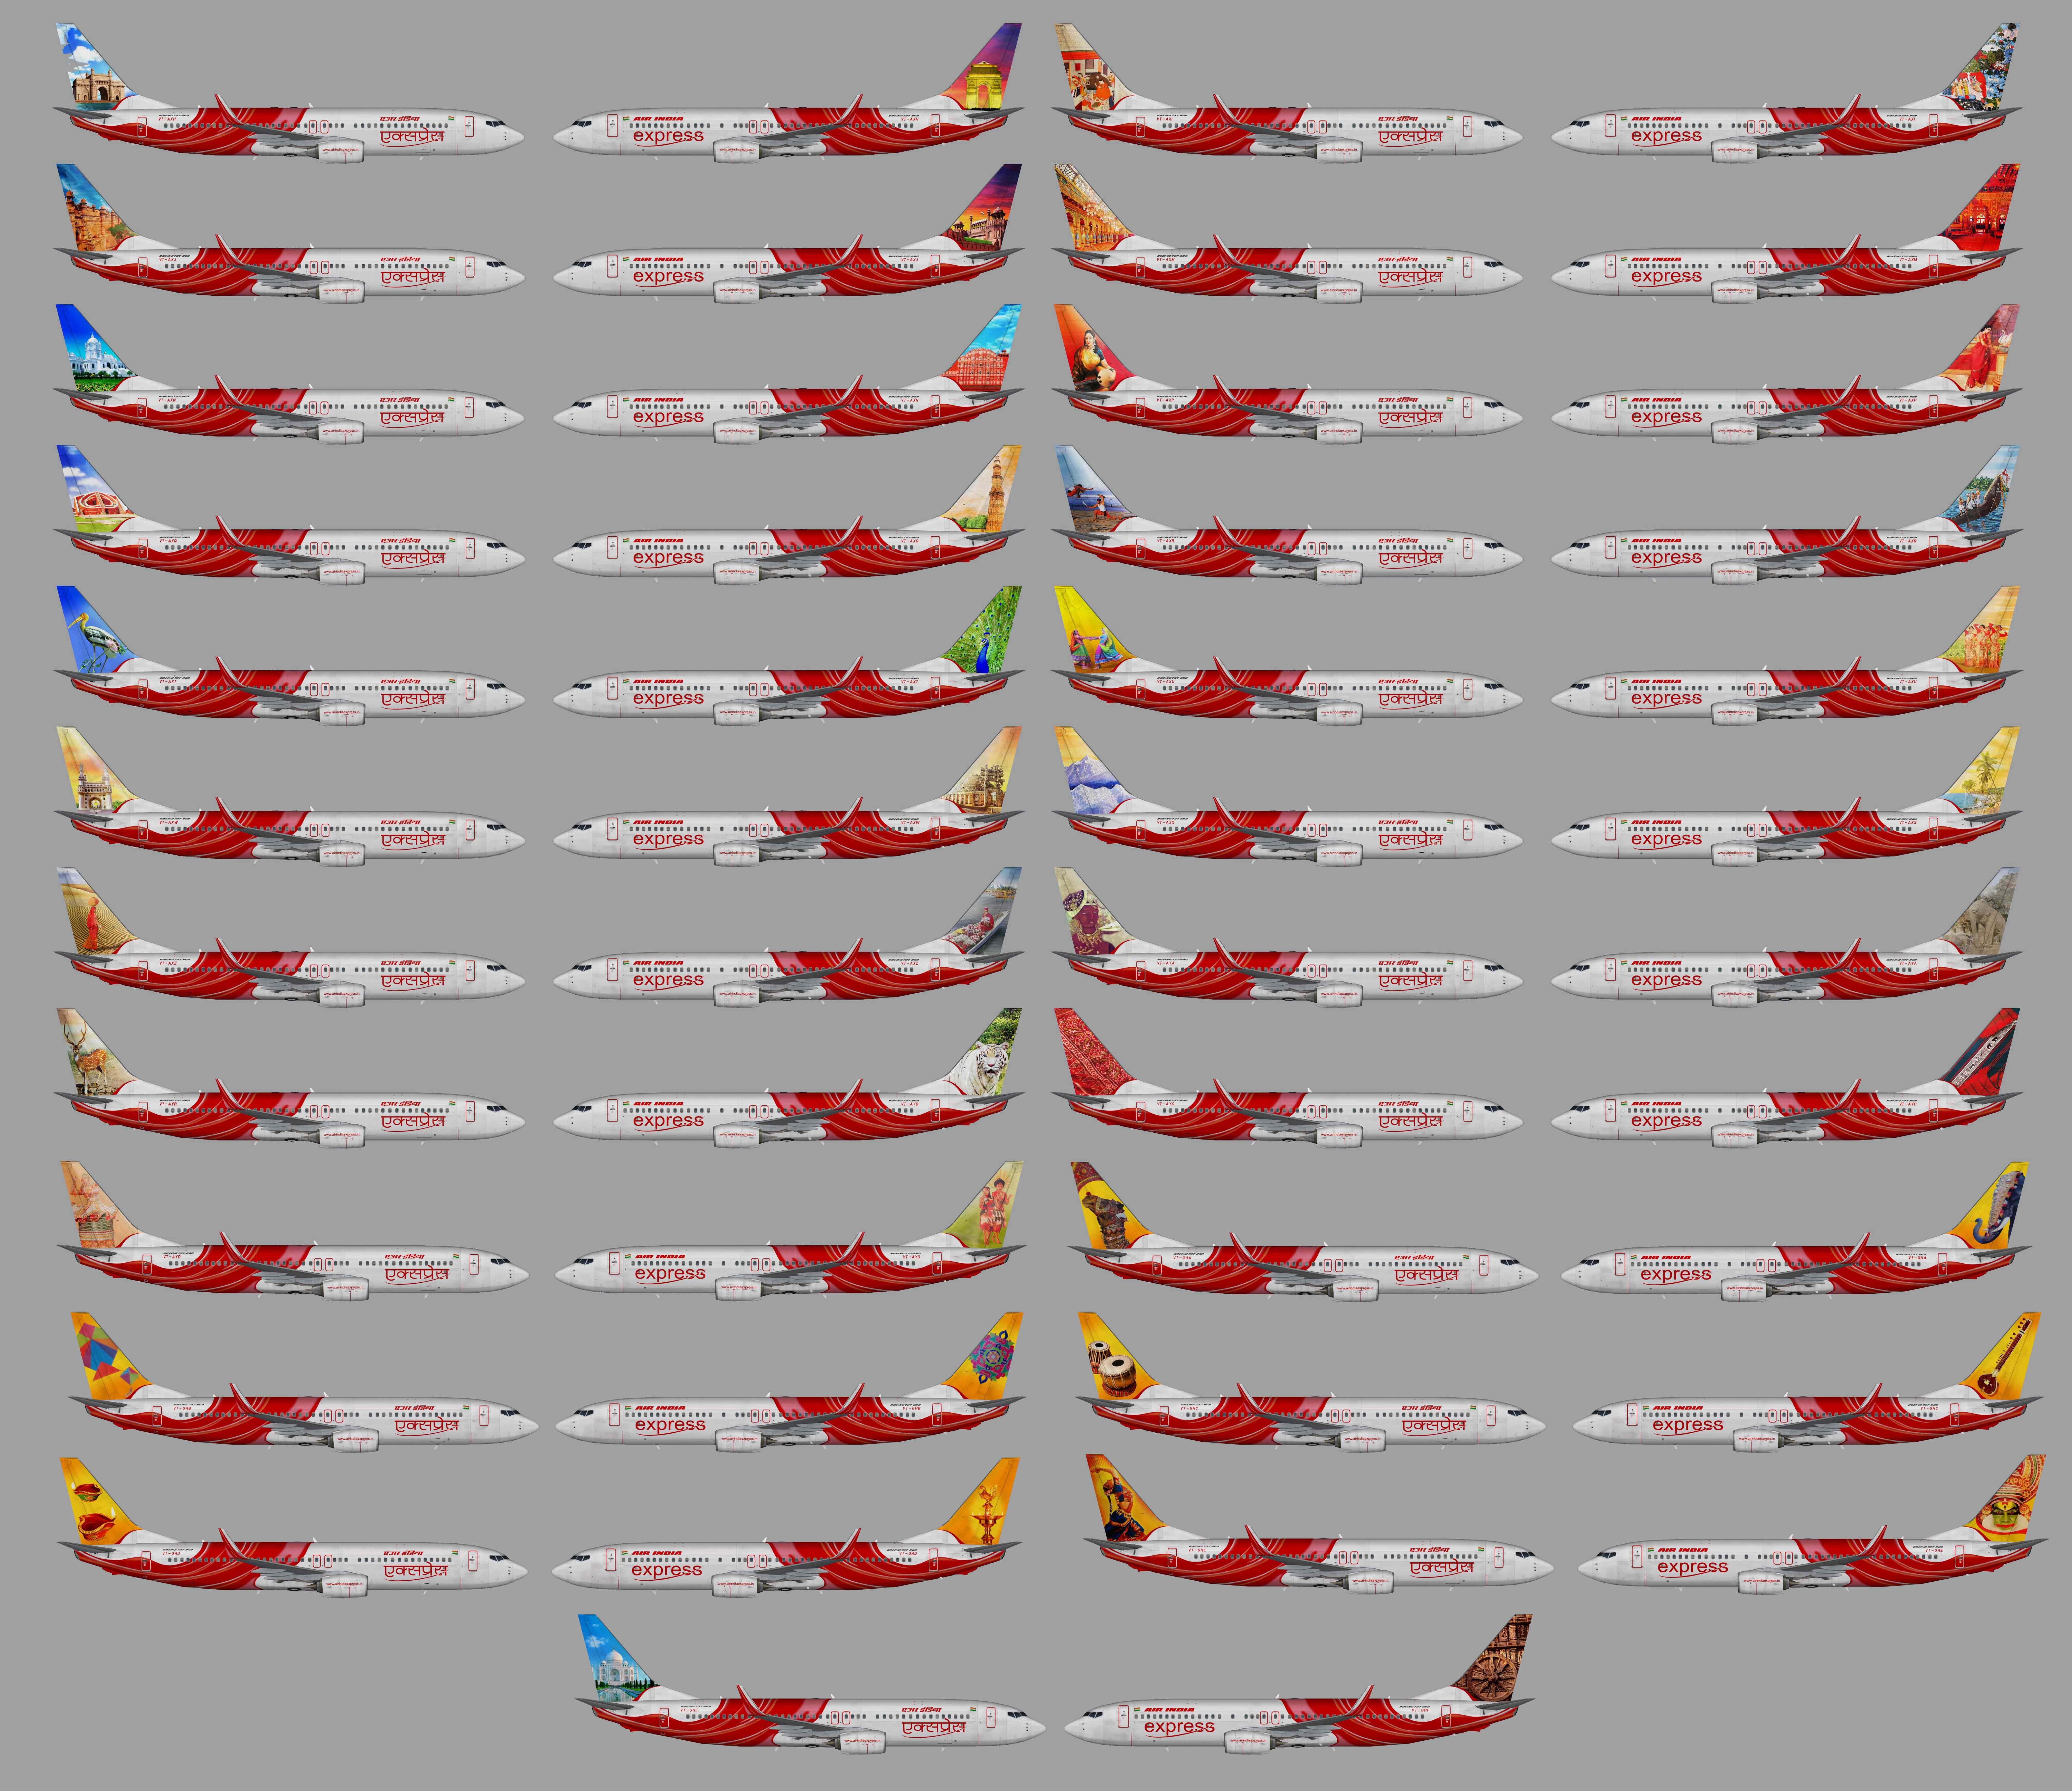 Air India Express Boeing 737-800w (full fleet)